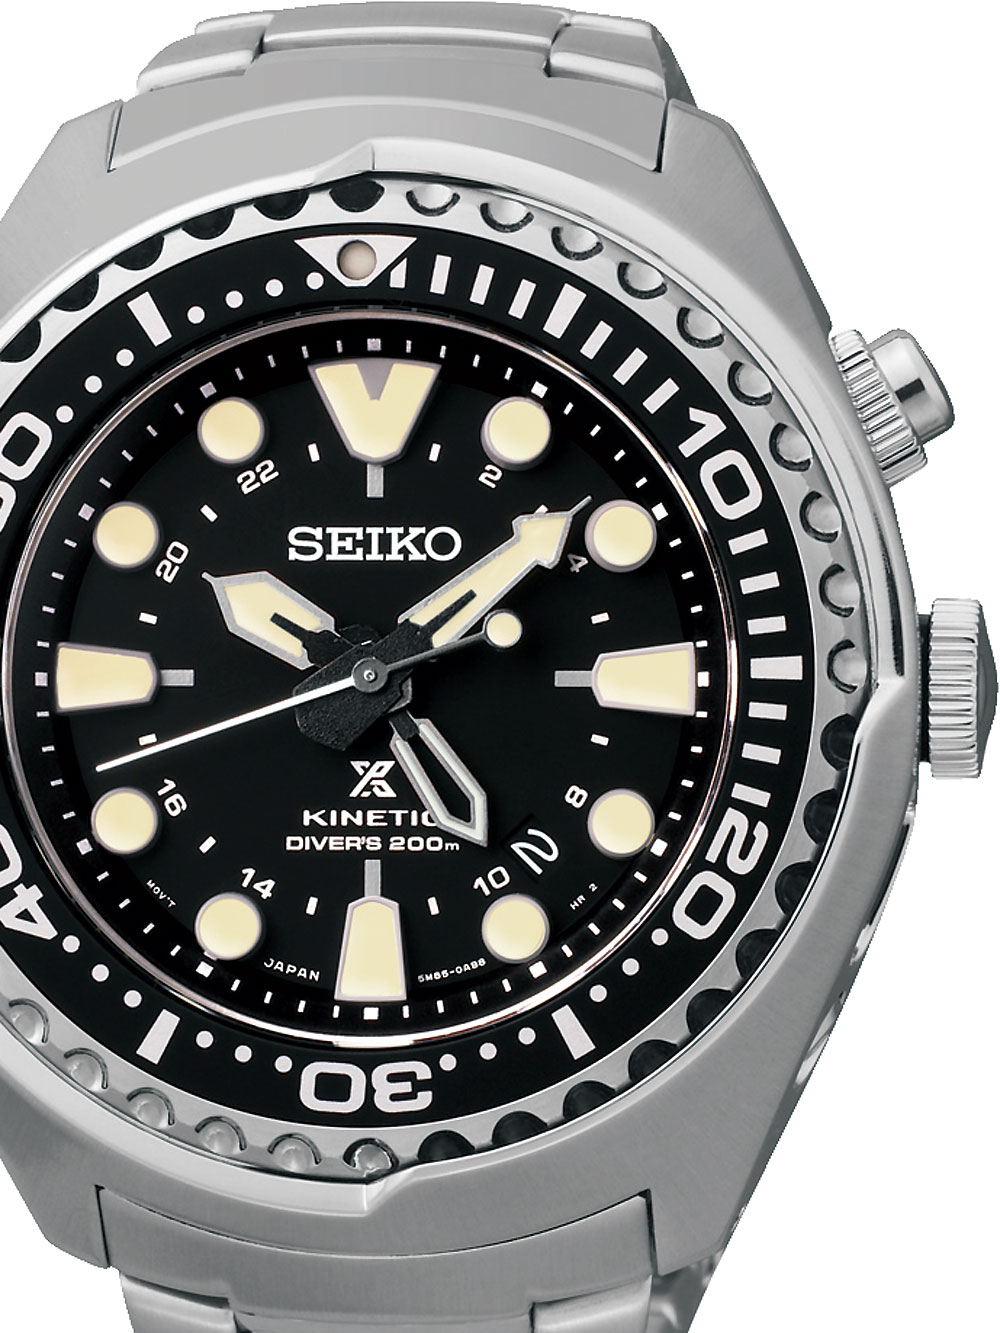 SUN019P1 Prospex Kinetic Diver GMT 200M 48mm